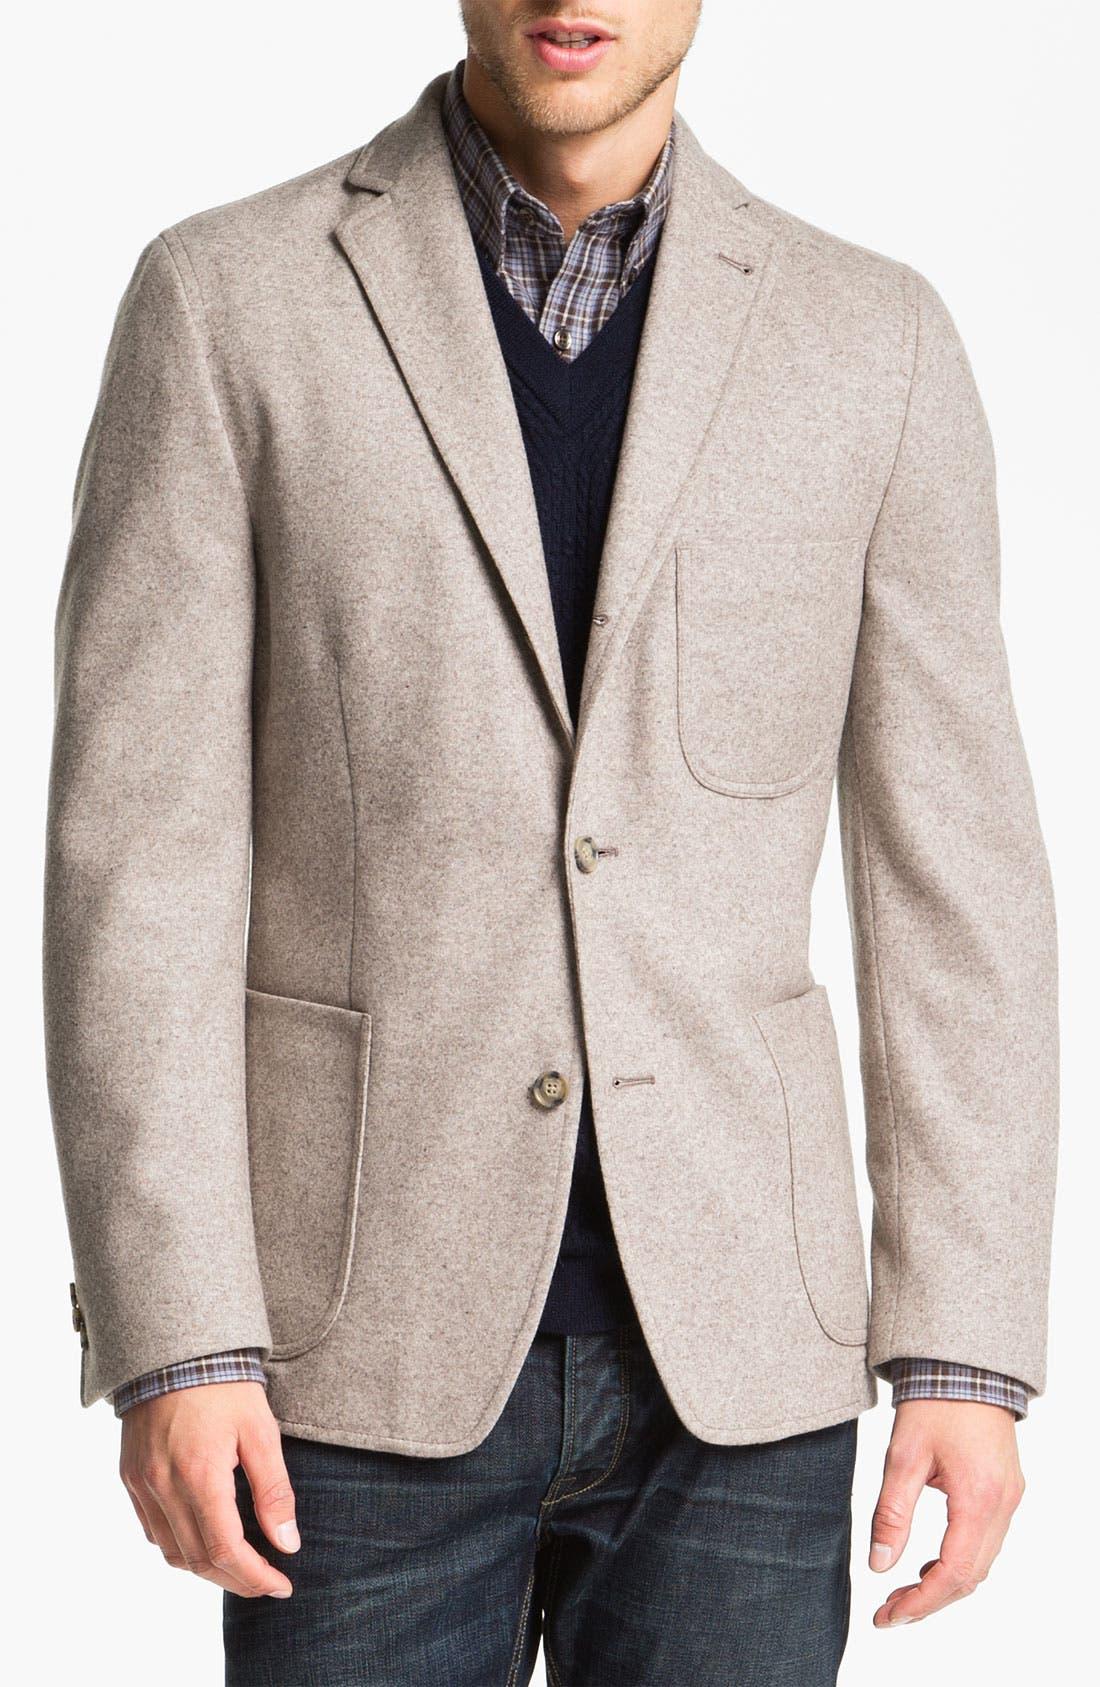 Alternate Image 1 Selected - Kroon 'Mayer' Wool & Cashmere Blend Knit Sportcoat